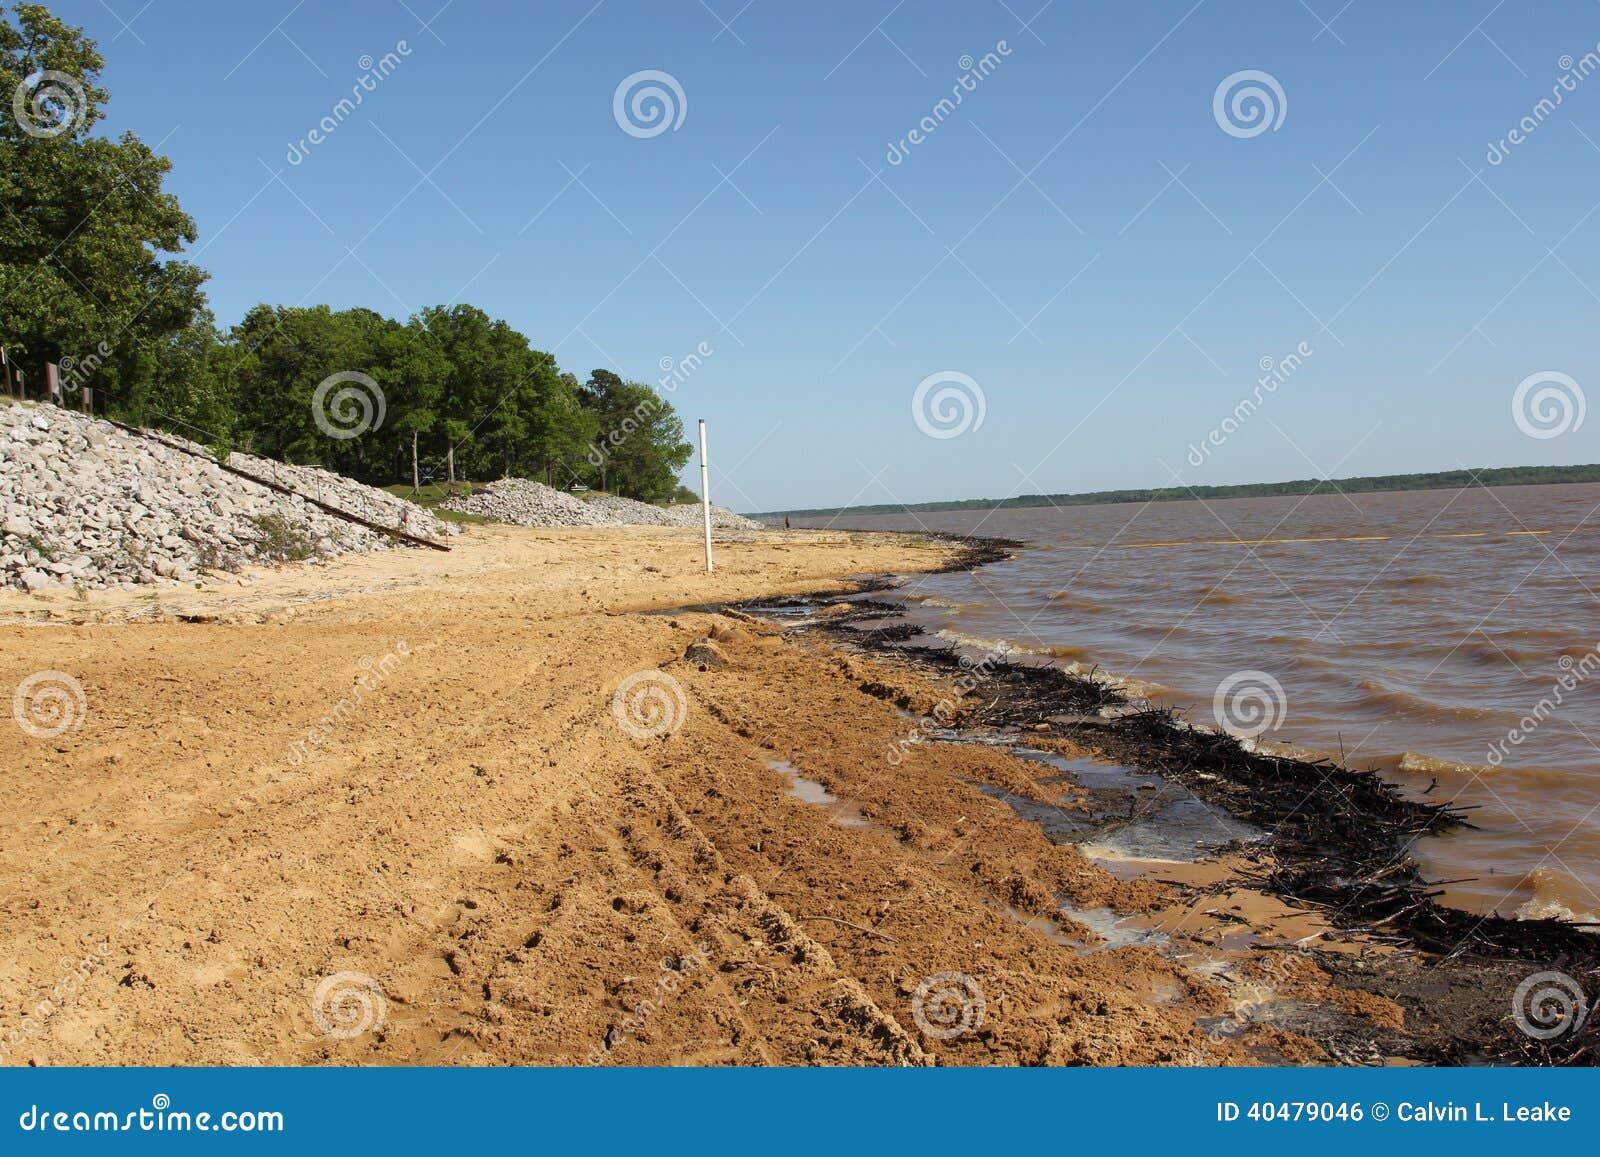 Arkabutla lake and beach stock photo image 40479046 for Lake front view